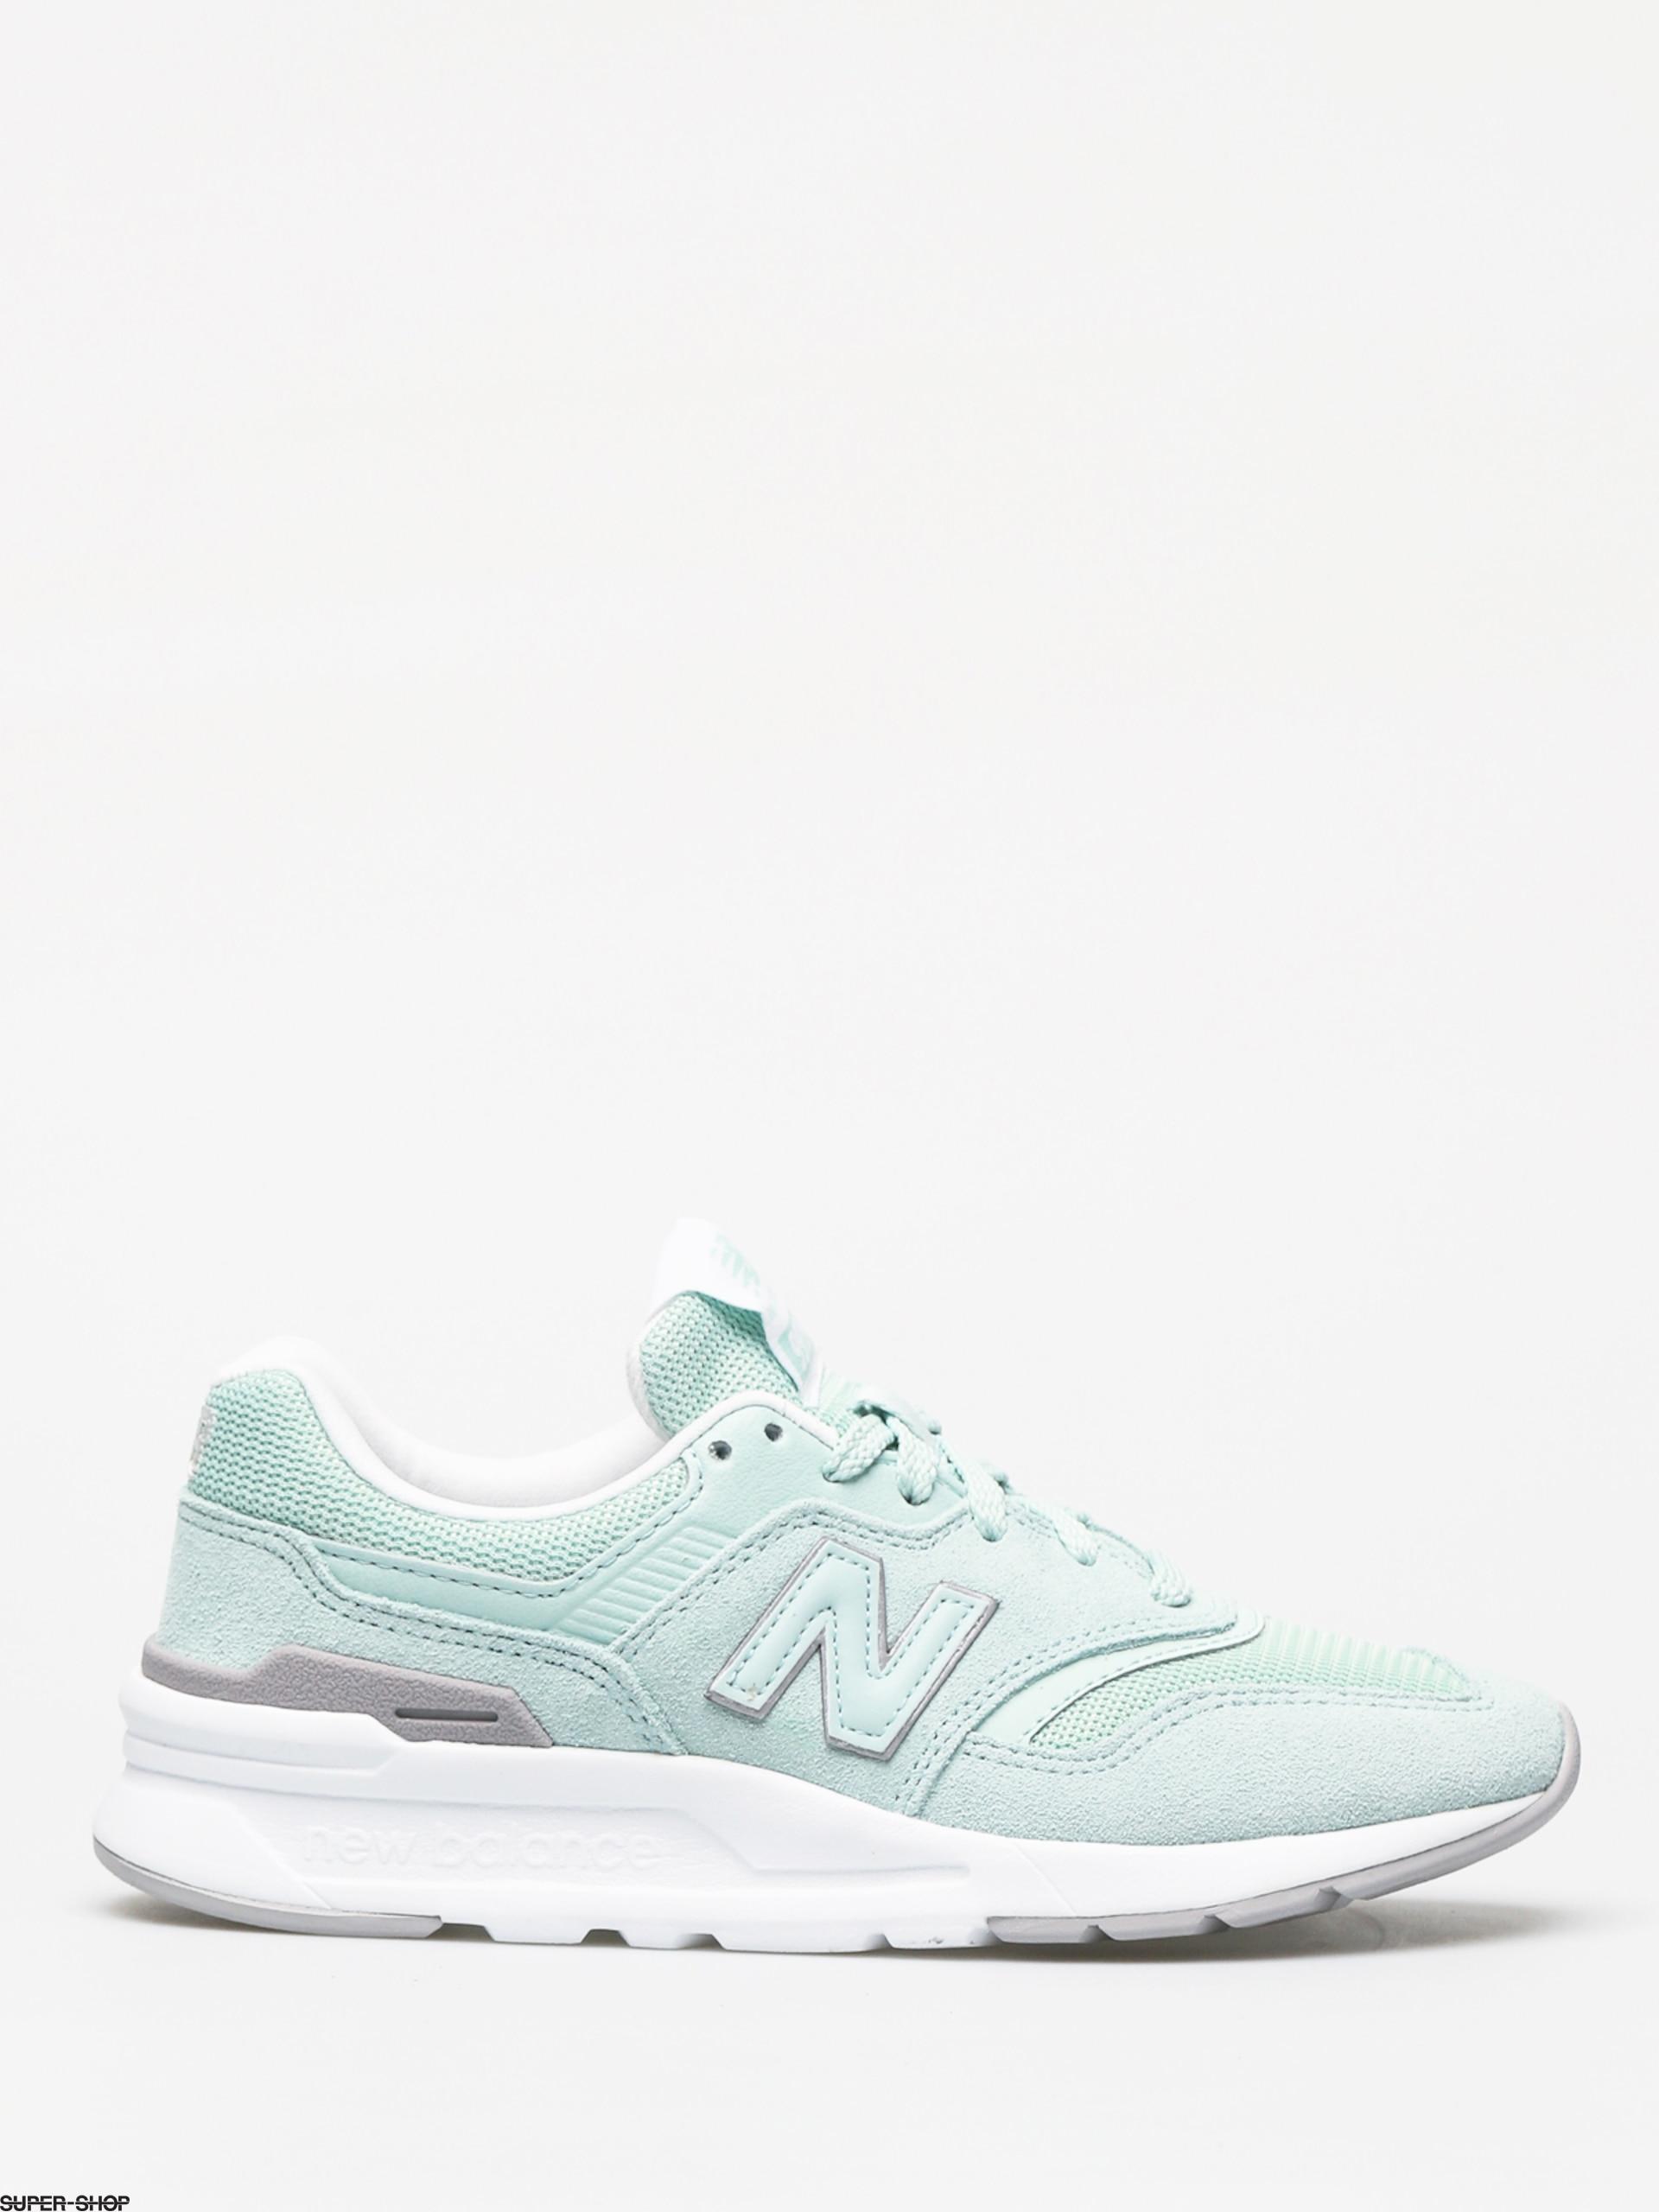 best website 63db8 e6e88 1010899-w1920-new-balance-997-shoes-wmn-white-agave.jpg